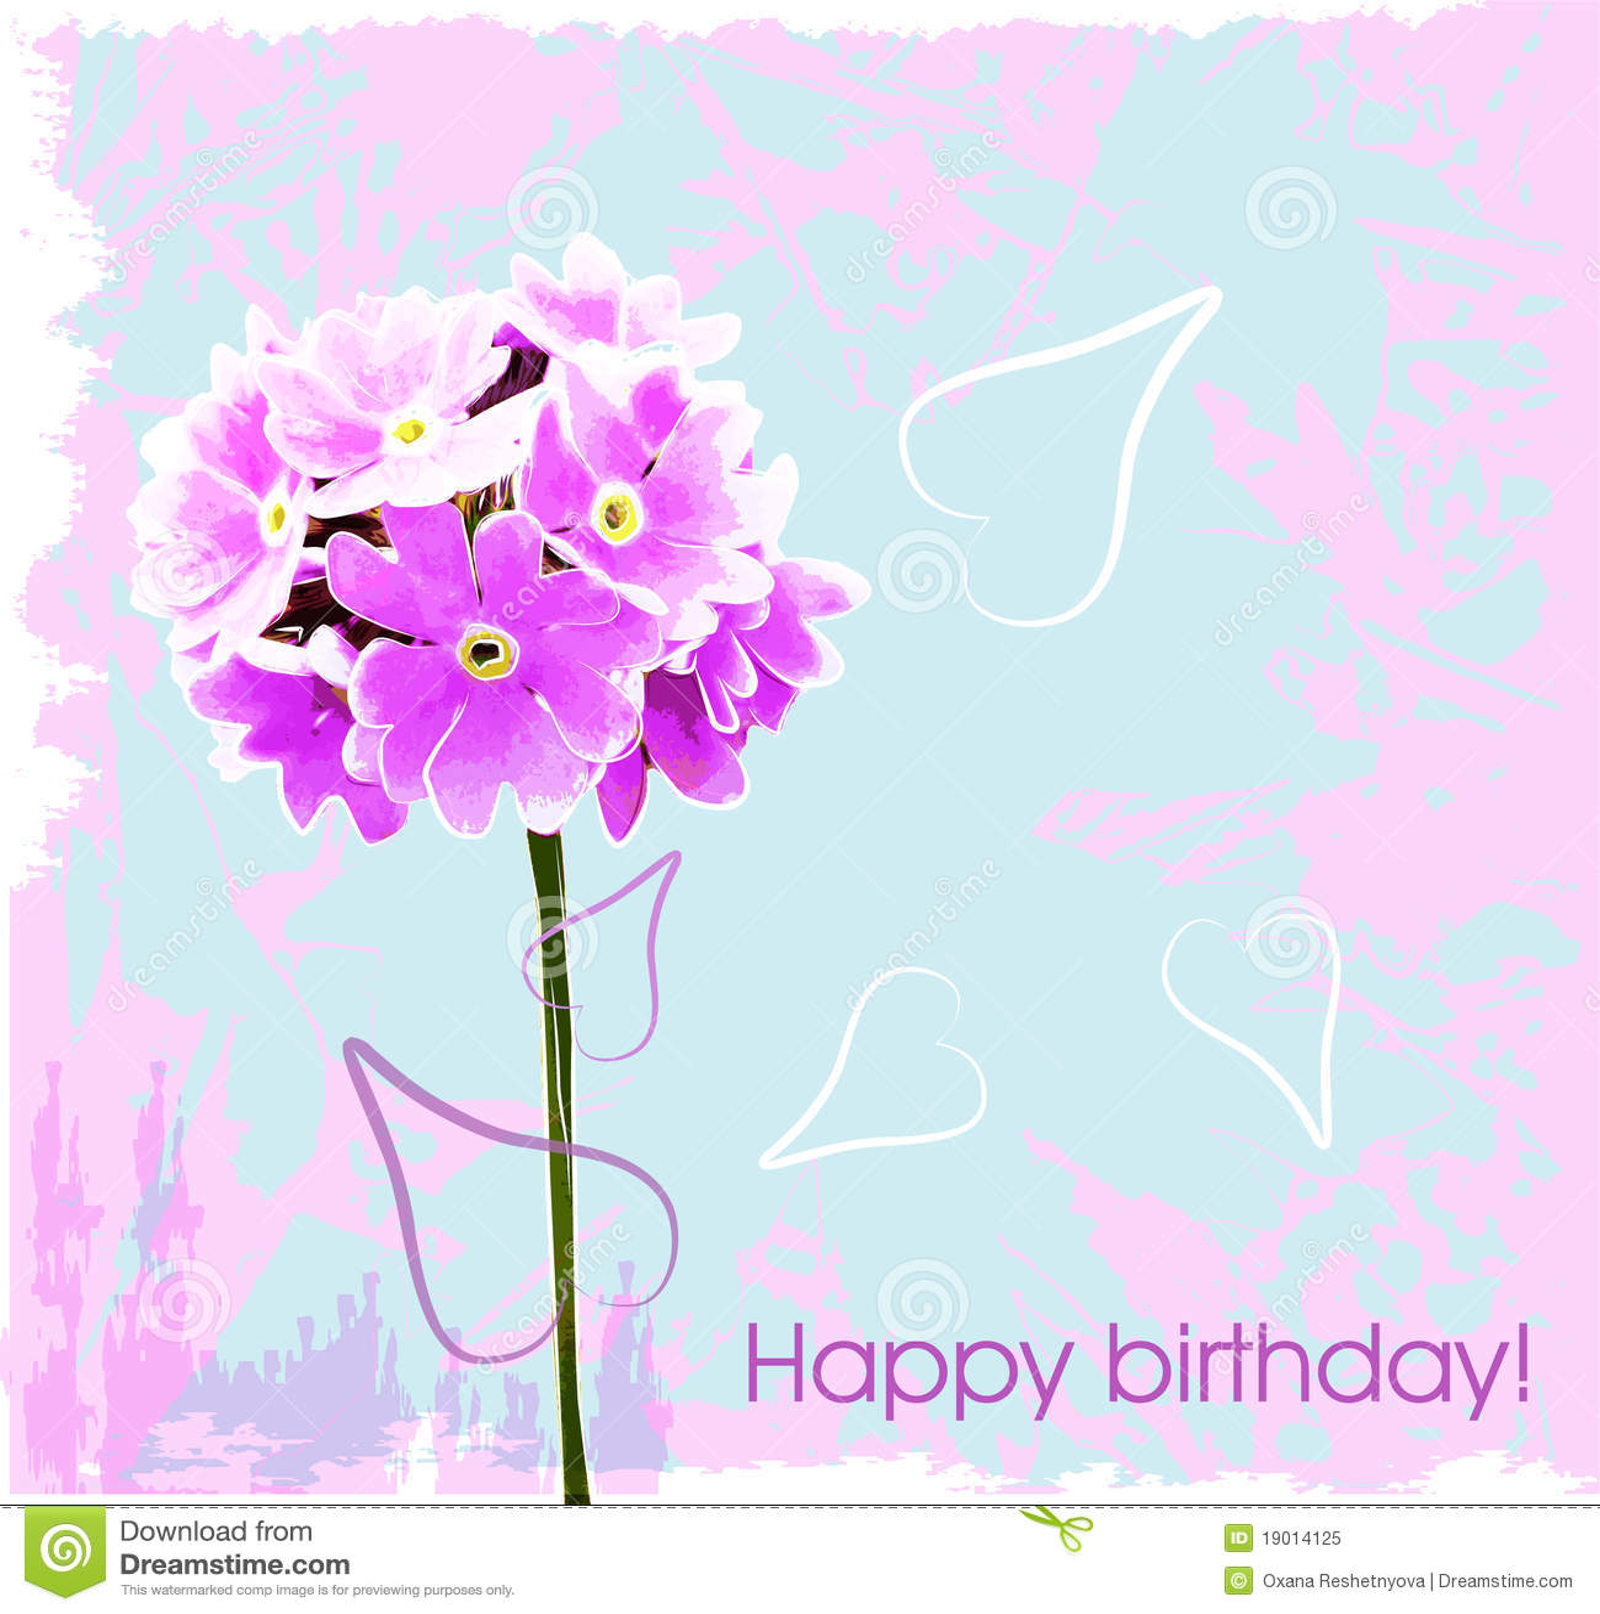 Royalty Free Birthday Images ~ Happy birthday card royalty free stock photo image